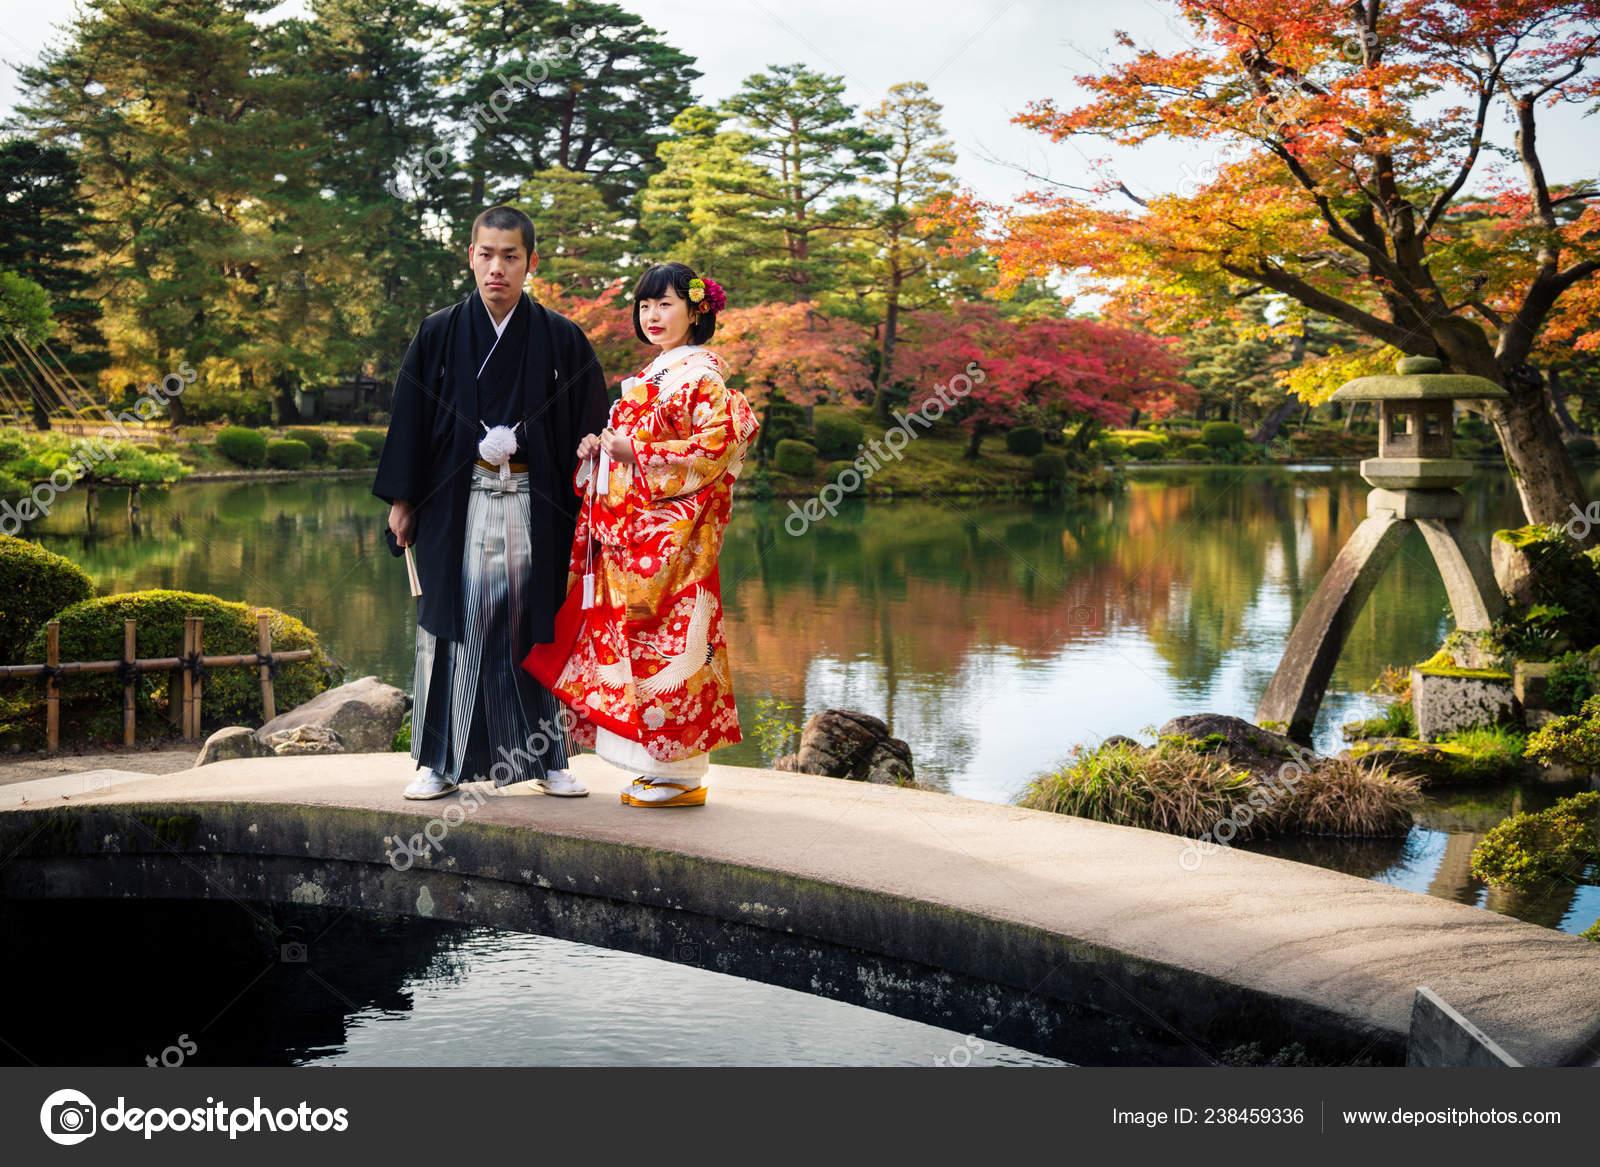 Japanese Wedding Kimono.Japanese Wedding Couple In Traditional Kimono Stand On A Bridge In